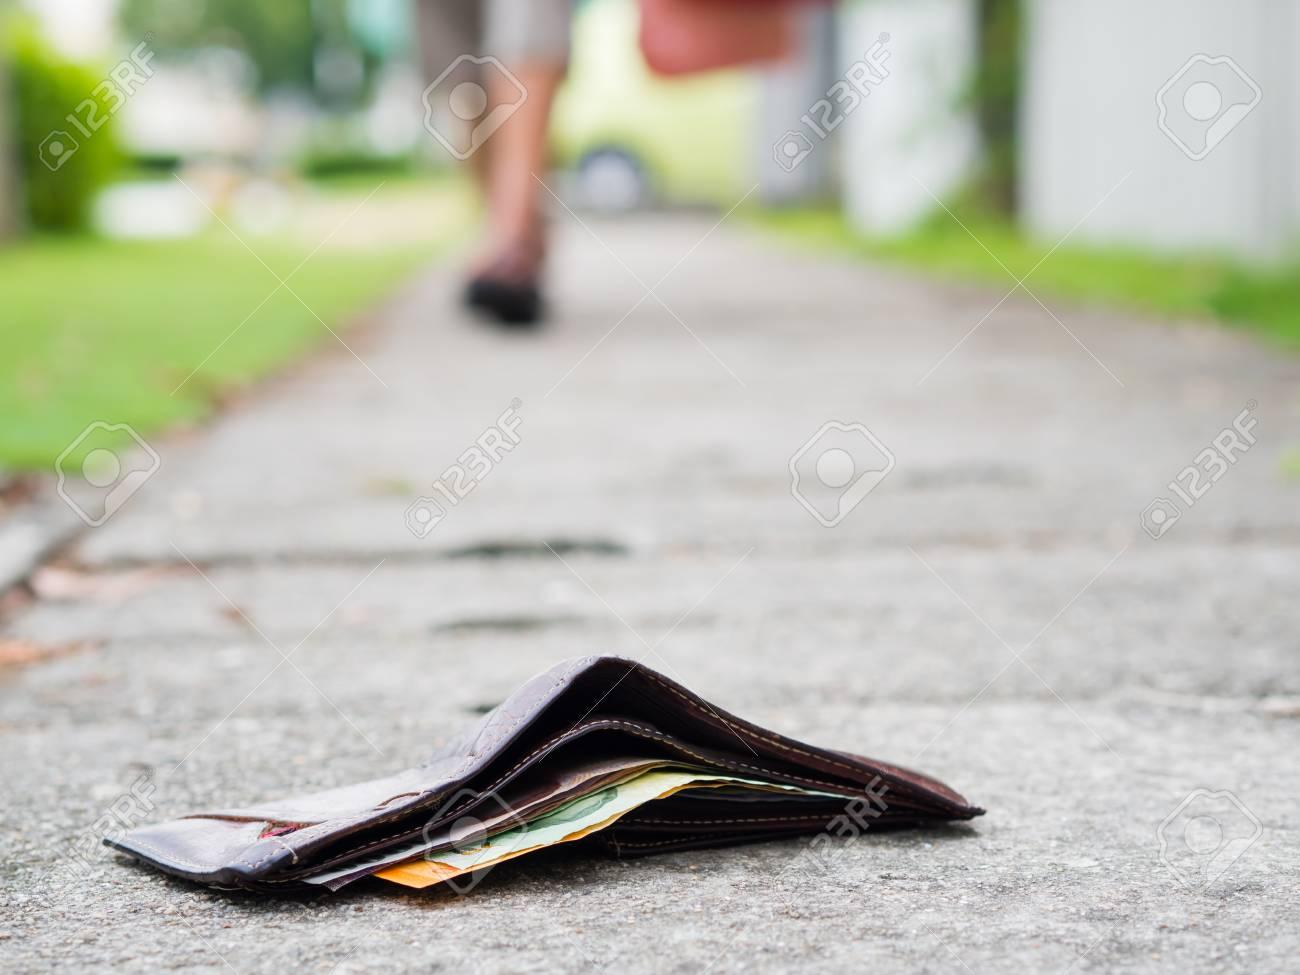 Money On Wallet With Lost Drop Money Leather Sidewalk